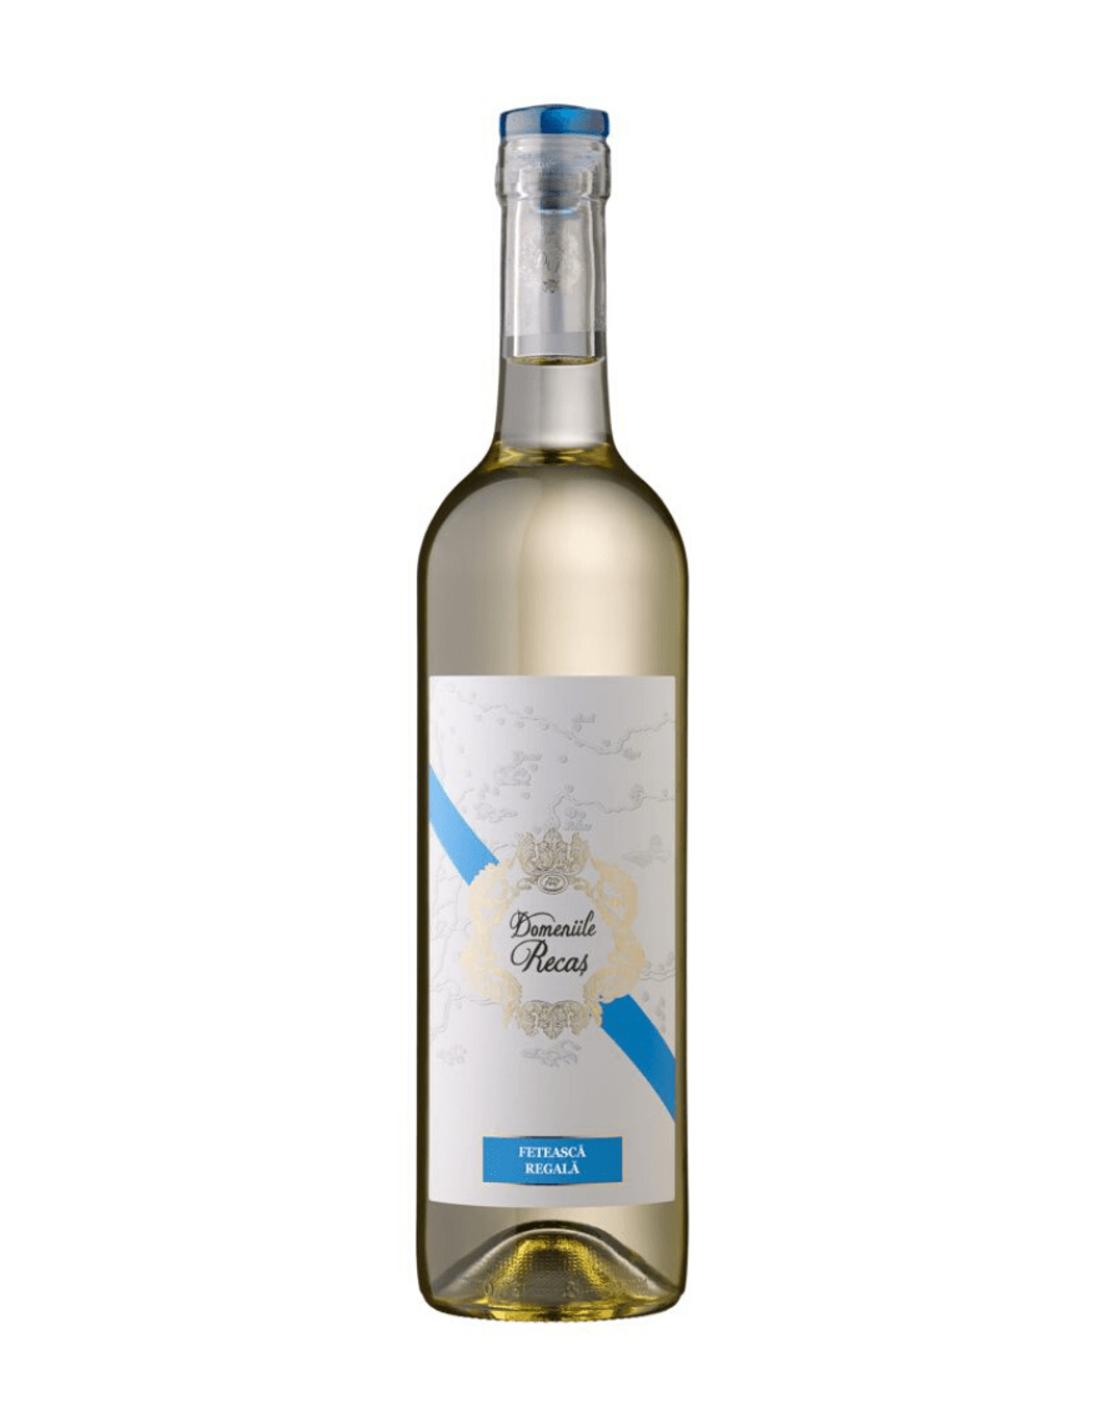 Vin alb demisec, Feteasca Regala, Domeniile Recas, 12% alc., 0.75L, Romania